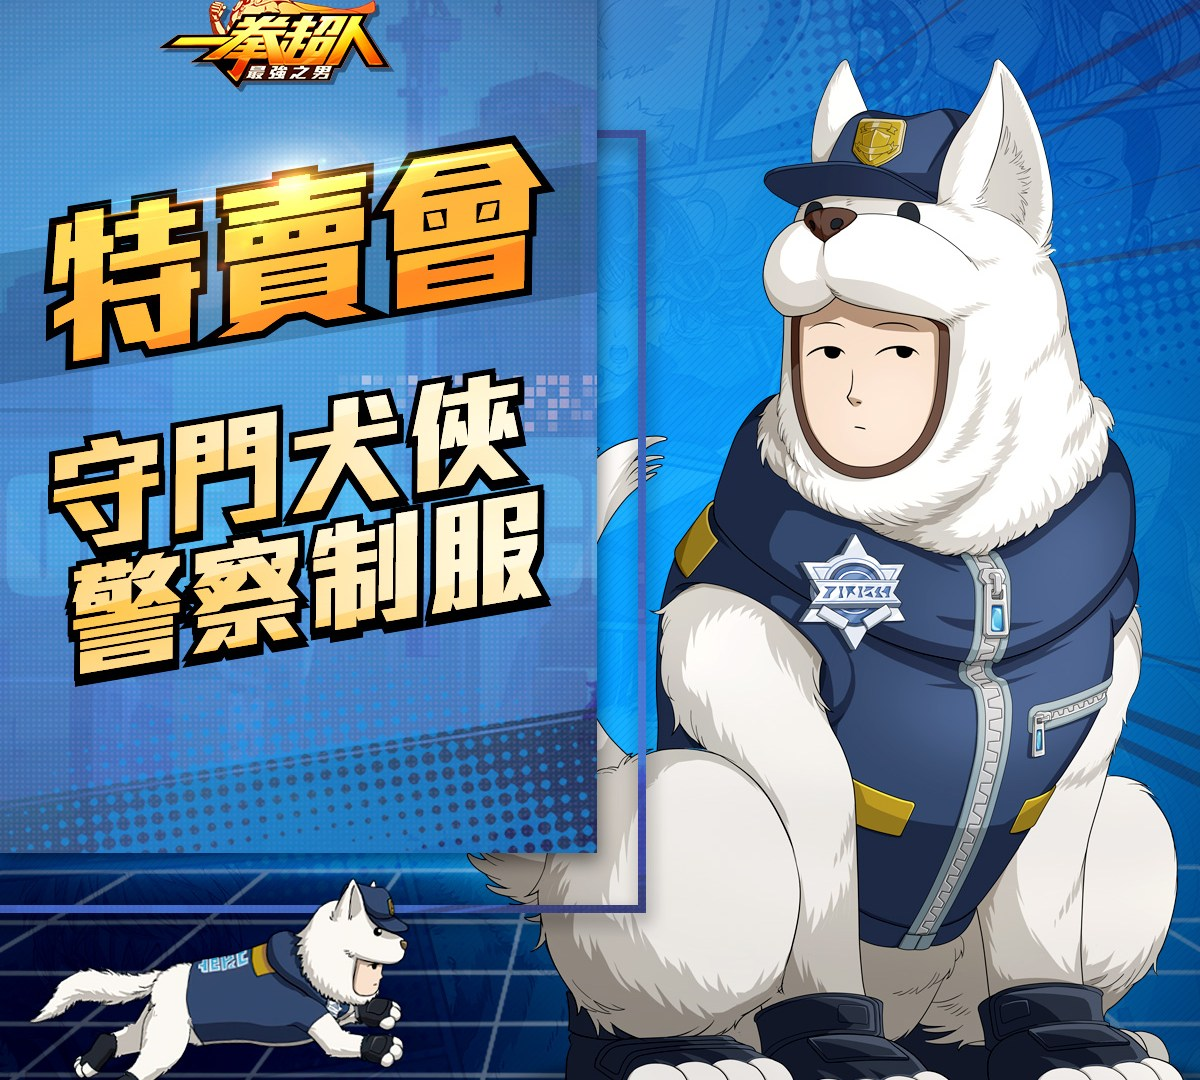 【GAMENOW新聞稿用圖02】《一拳超人:最強之男》「守門犬俠 警察制服」時裝特賣會 6 月 13 日再次帥氣亮相!